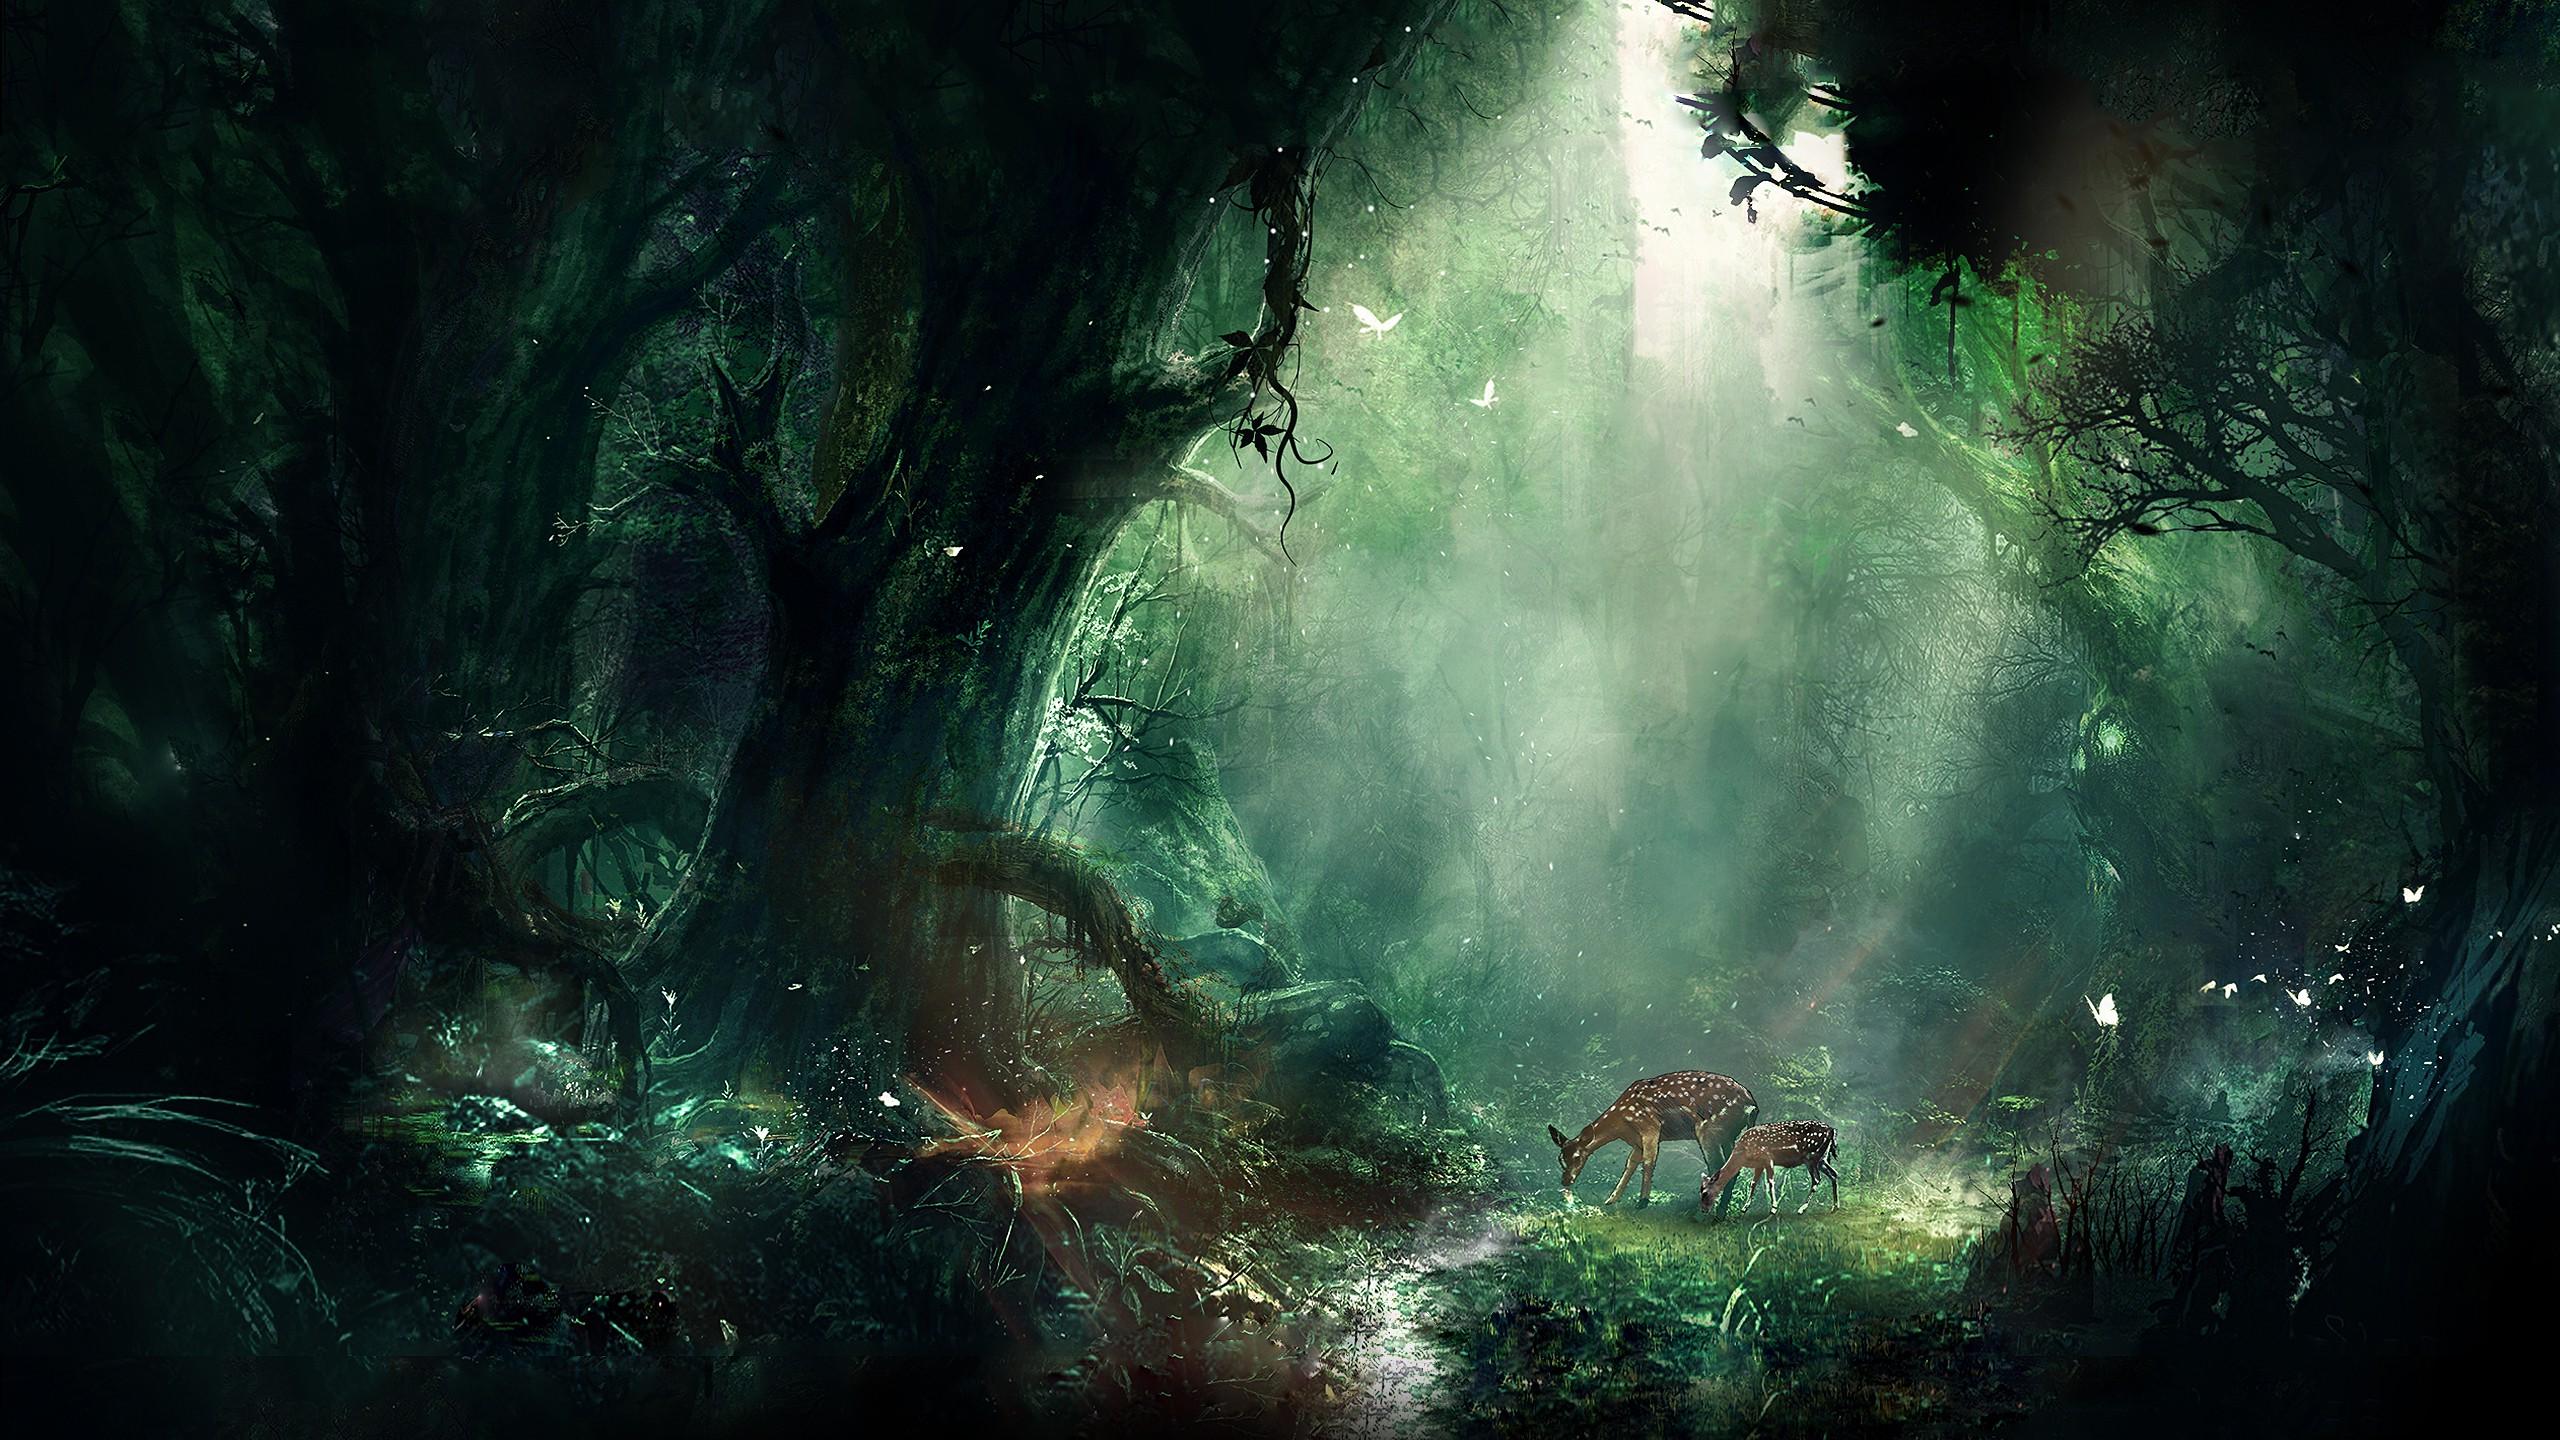 Wallpaper Sunlight Forest Animals Fantasy Art Nature